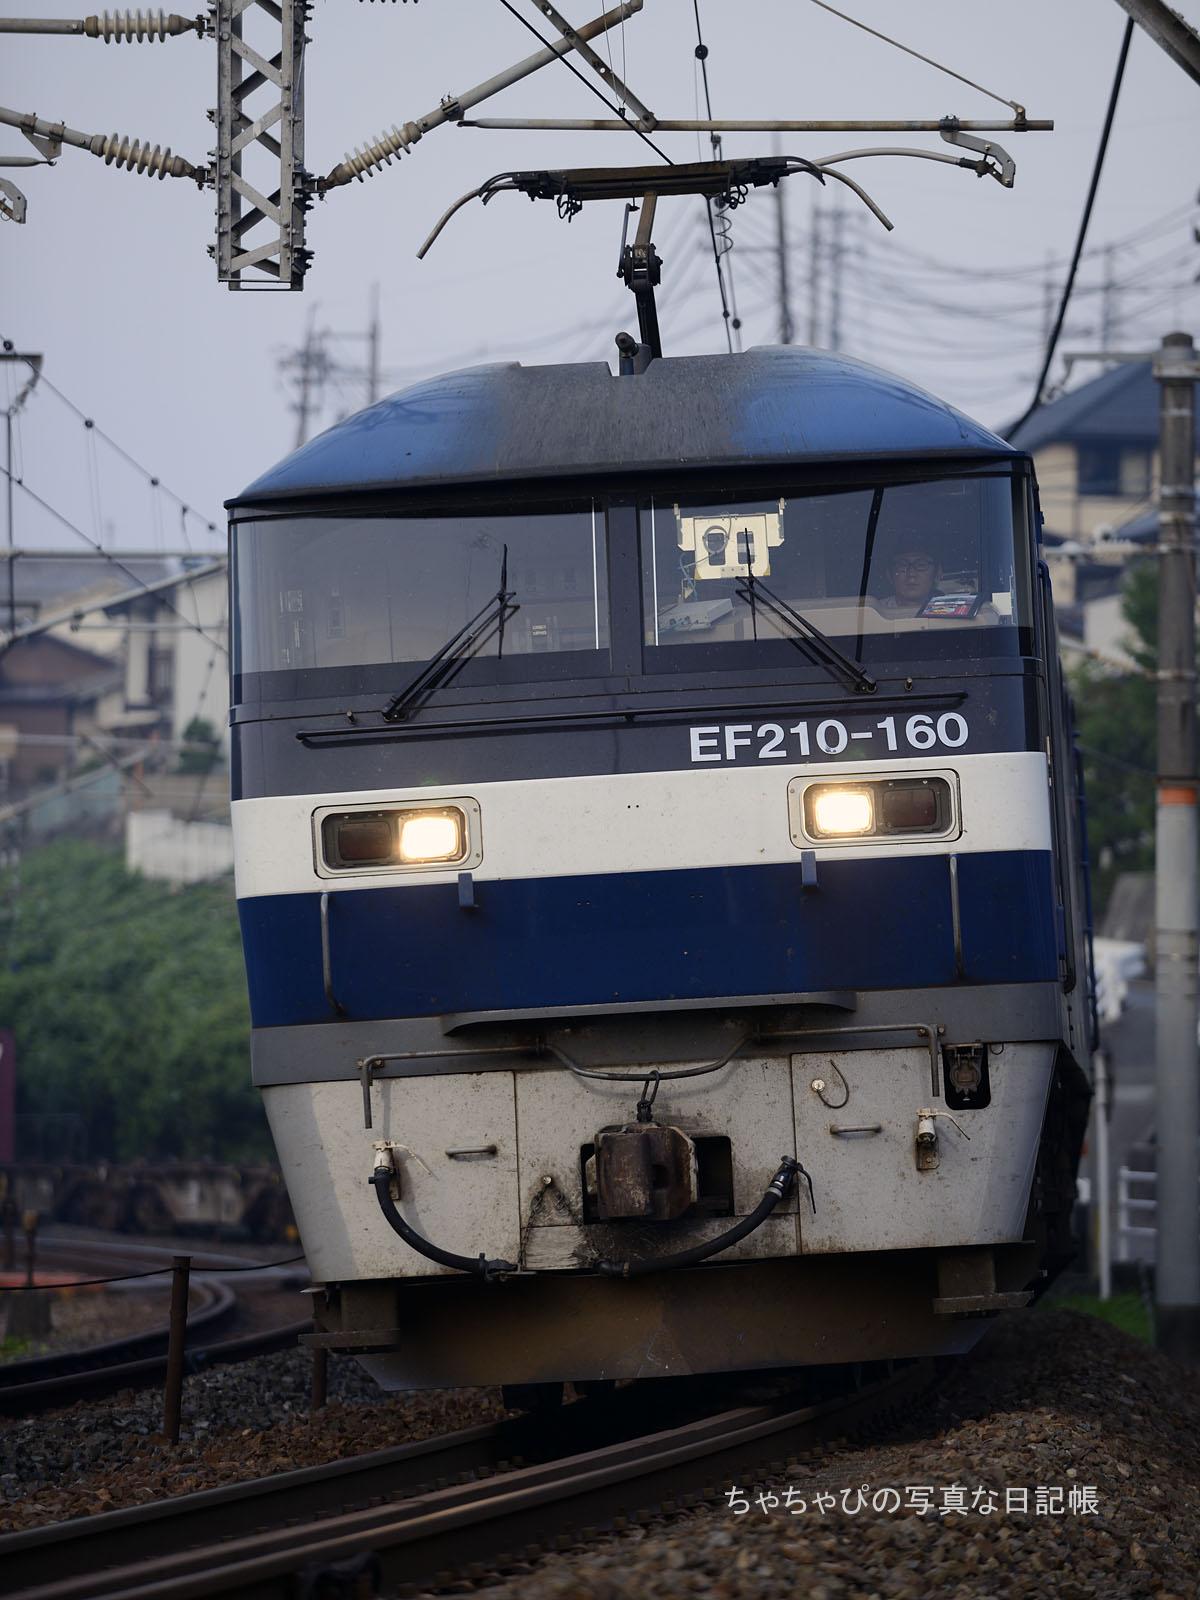 1062レ、EF210-160 中野東駅~瀬野駅